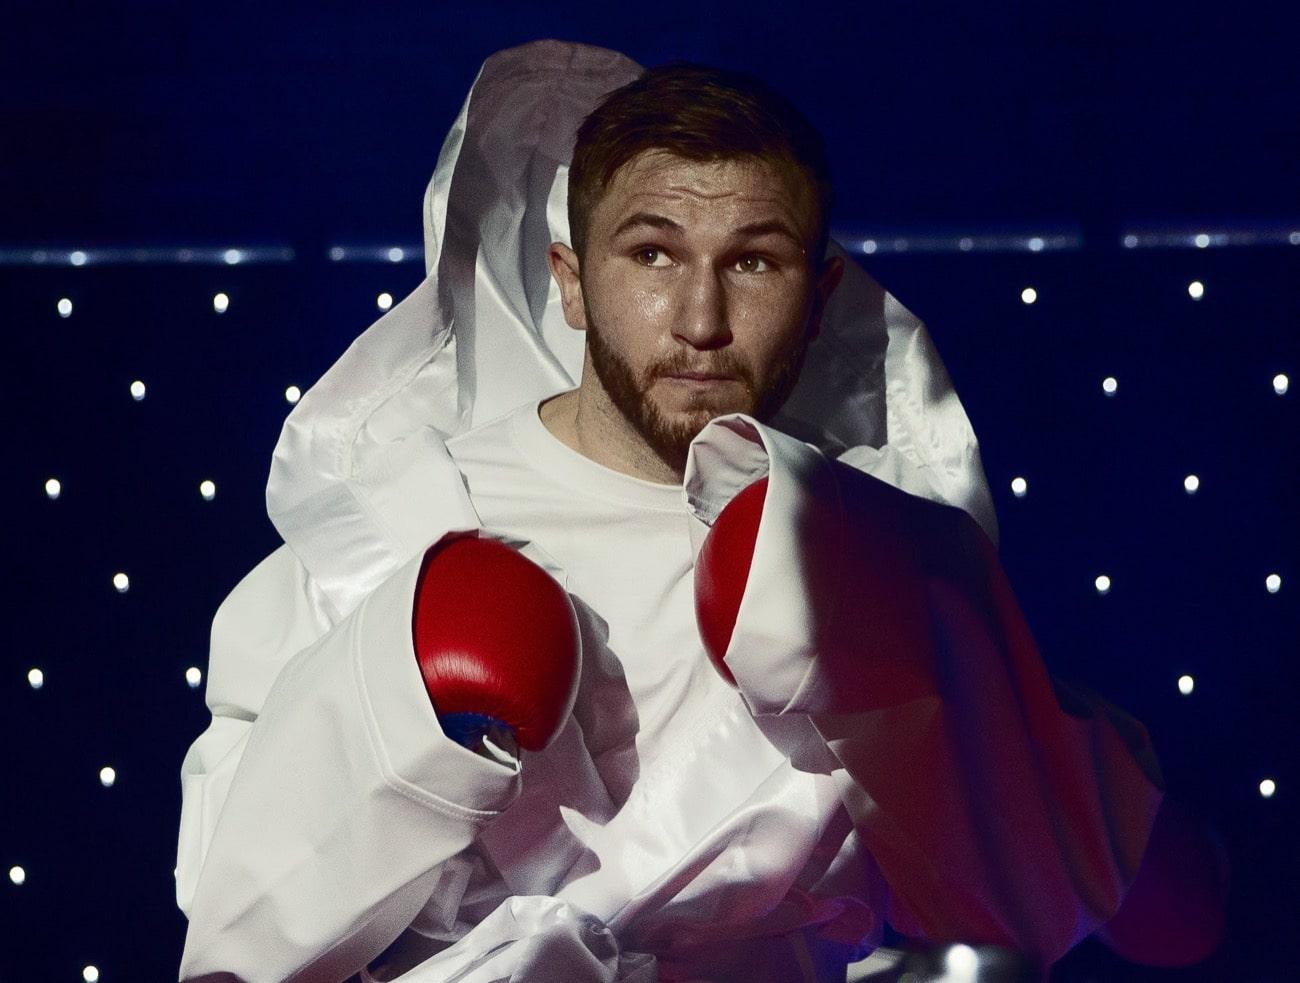 Isaac Lowe - British Boxing